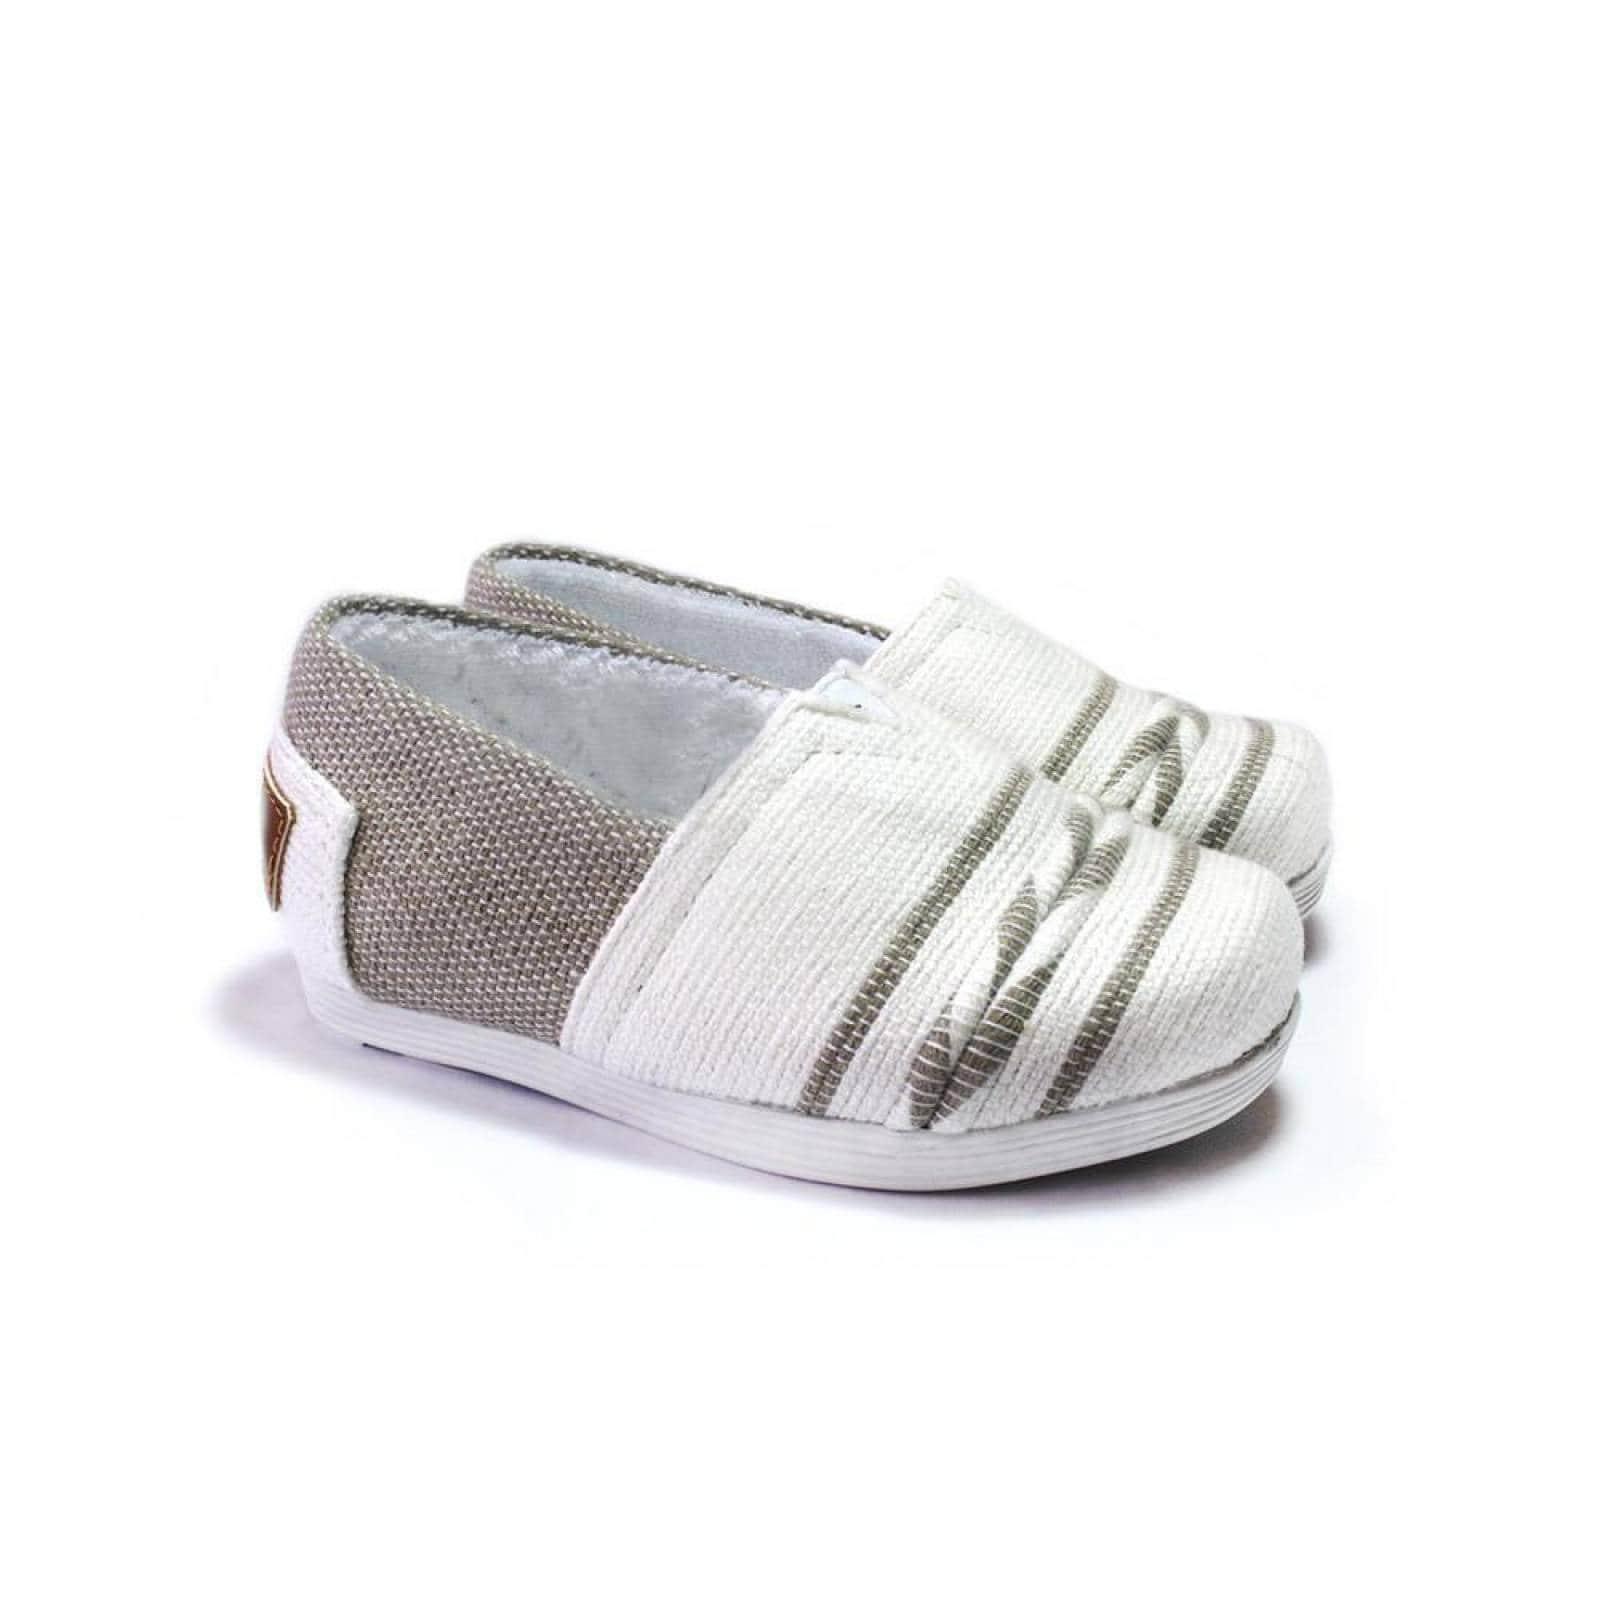 Zapato Alpargata Mini Jacinta Artesanal Tela Infantil Beige Komoni Talla: 13